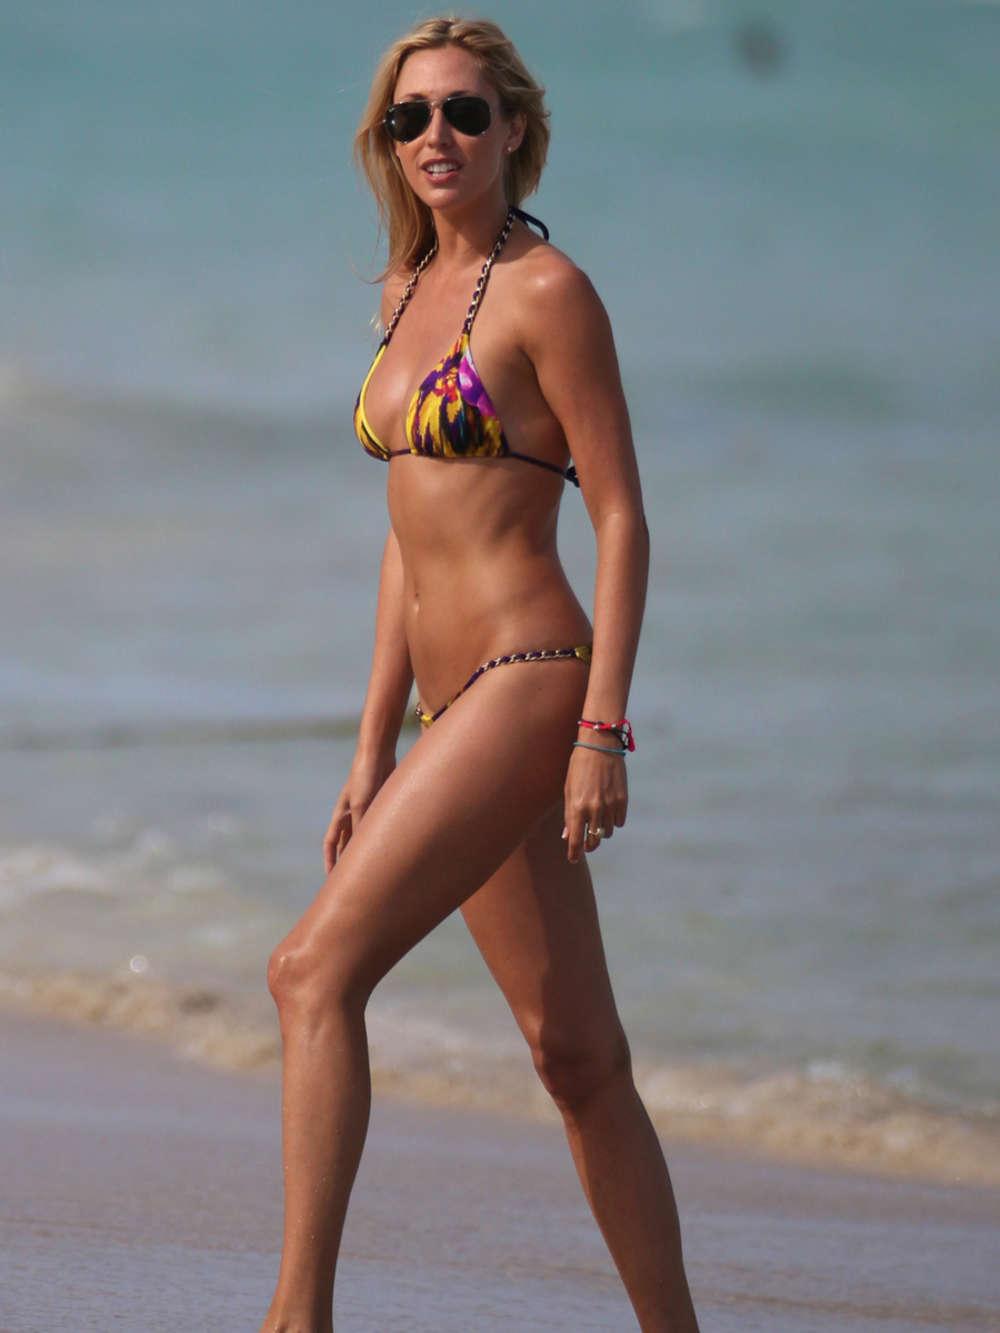 Bikini Lauren Stoner naked (97 foto and video), Ass, Hot, Boobs, legs 2006